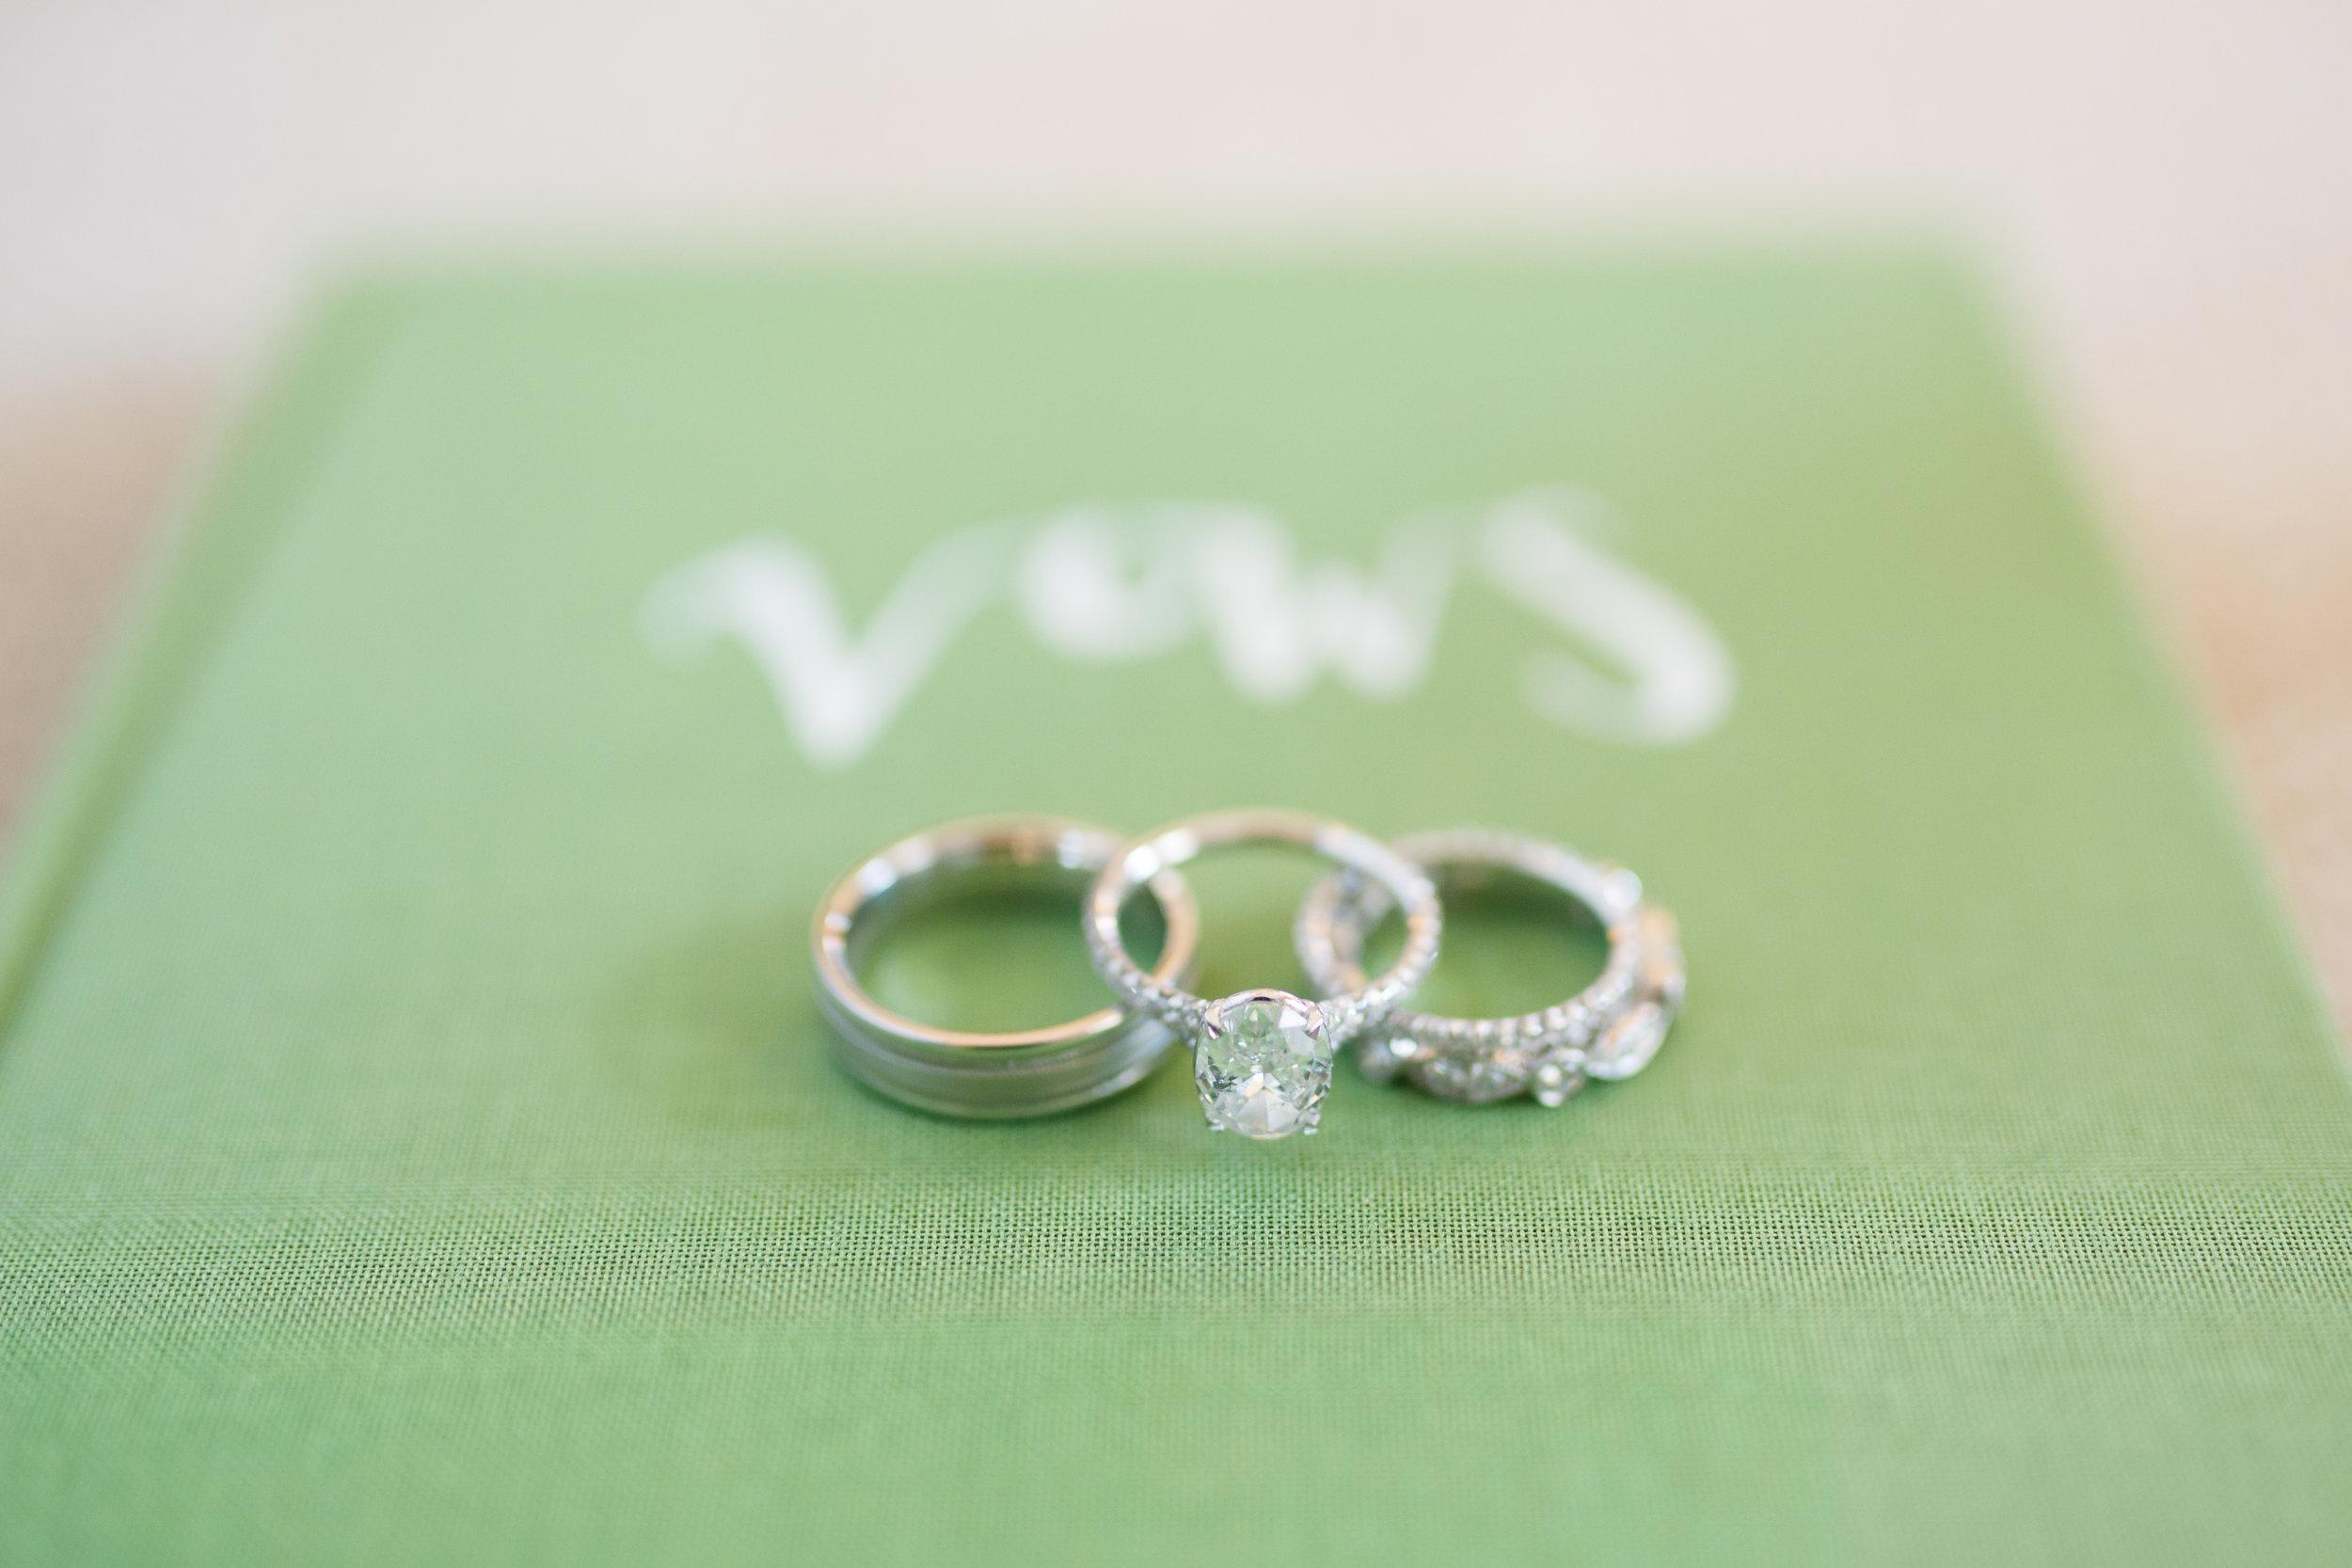 vows_book_green_rings.jpg